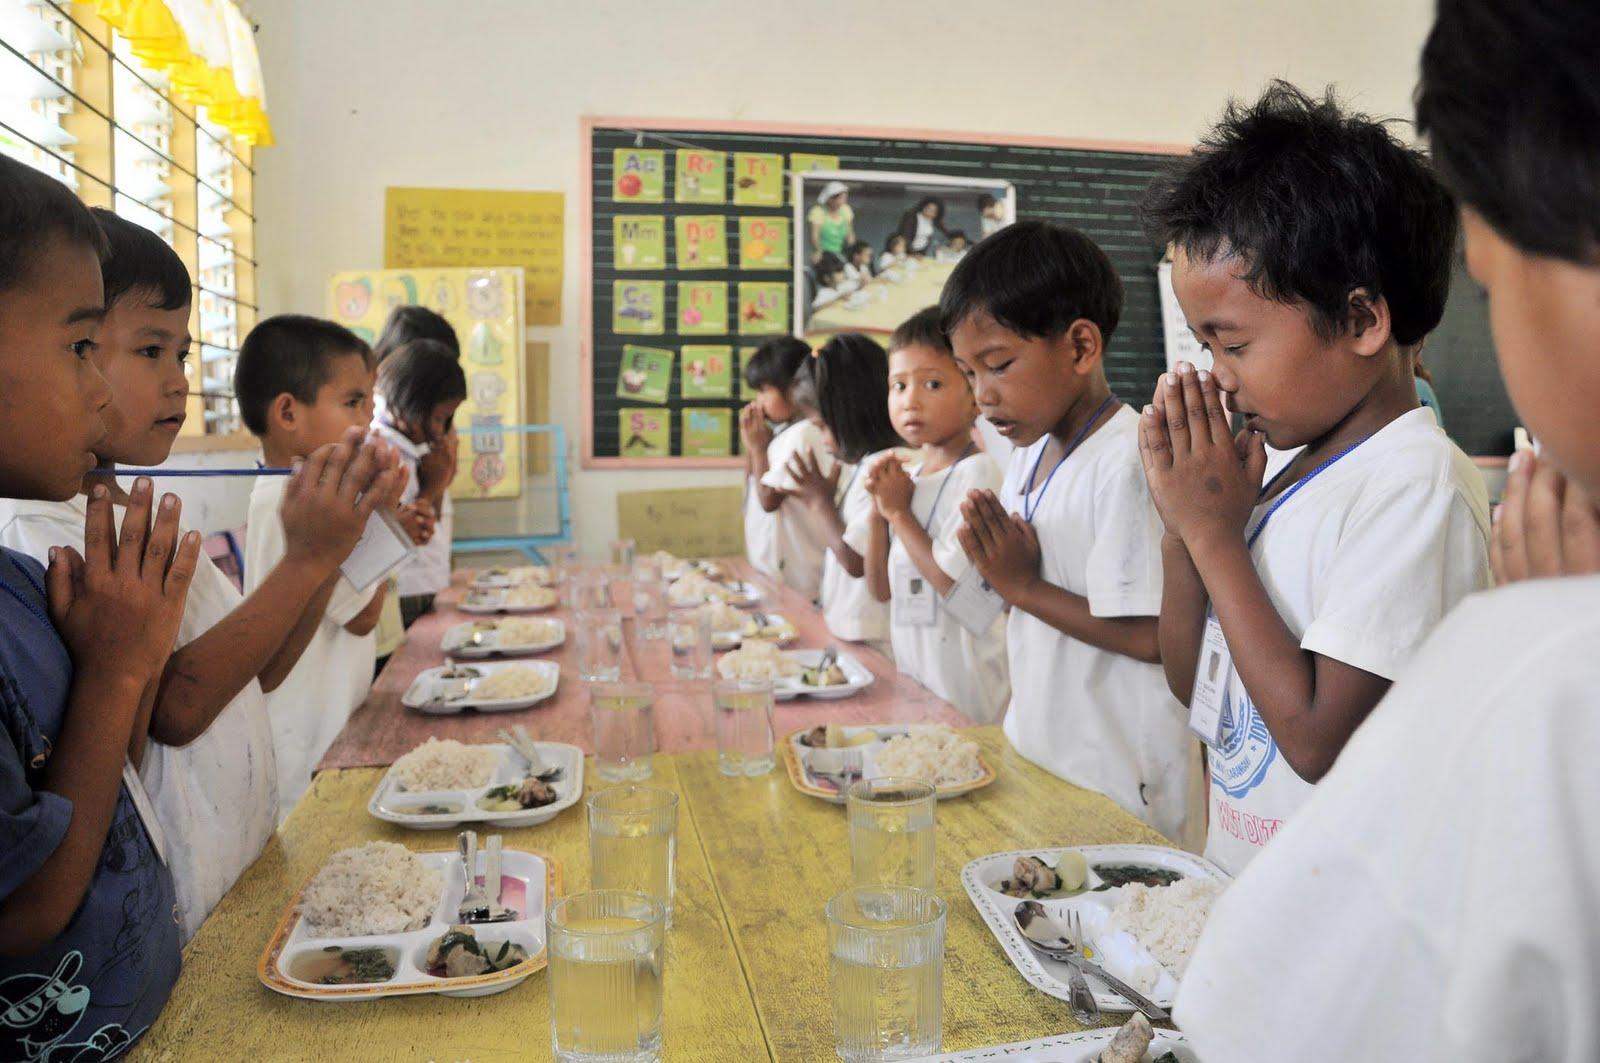 Sarangani Today: Prayer before meal